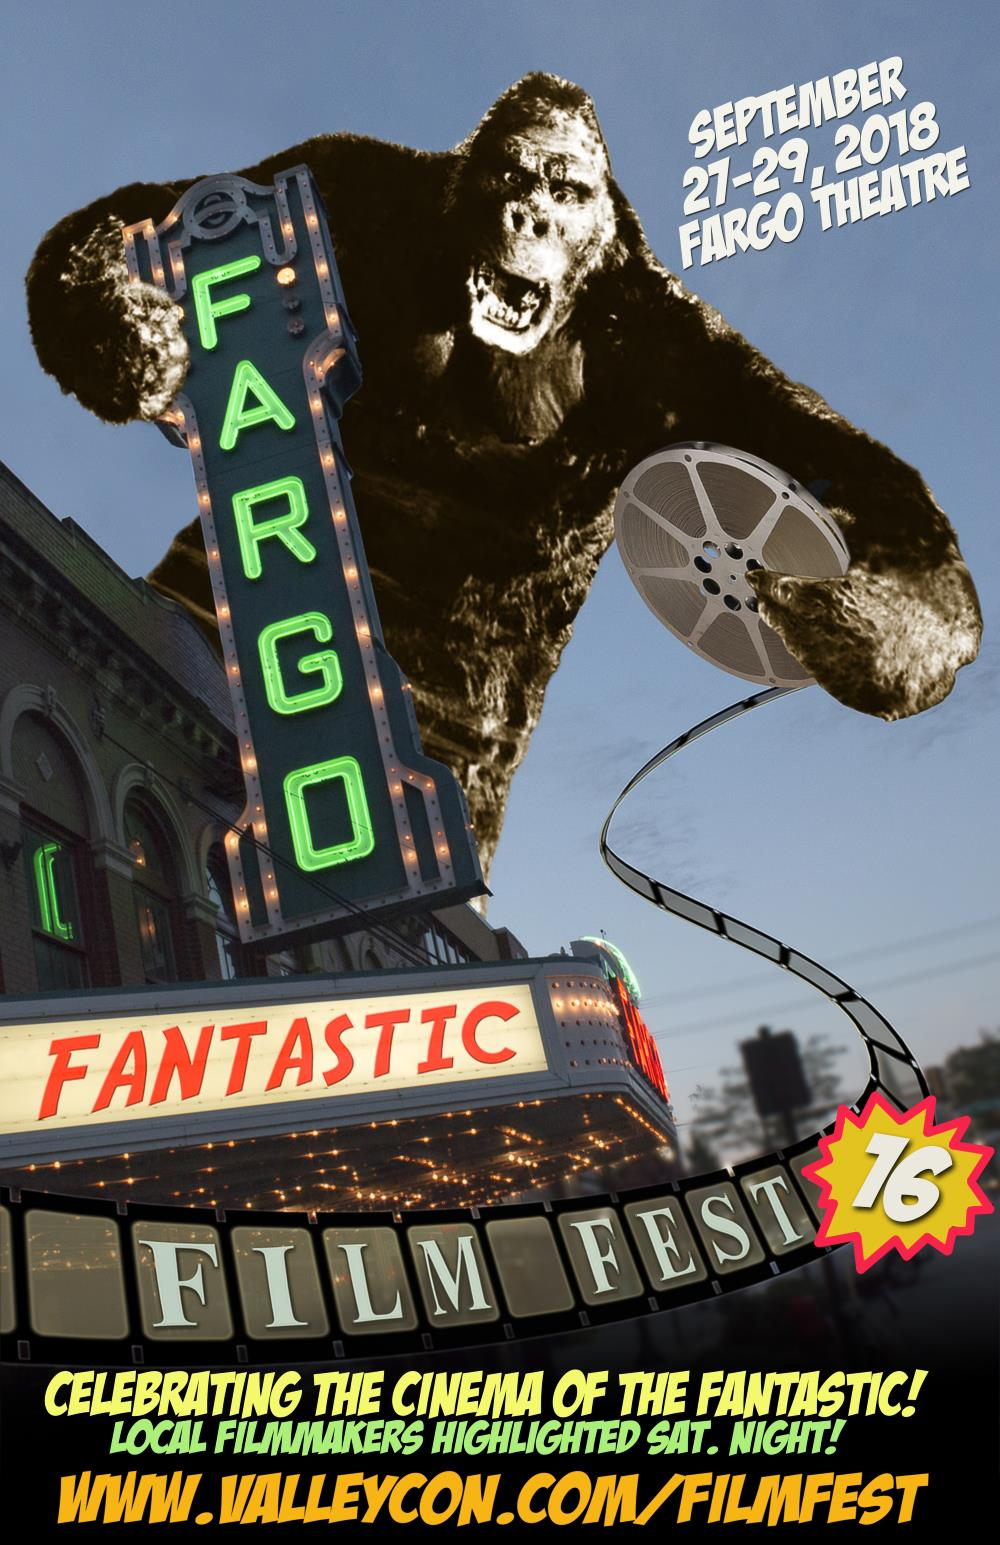 Fargo Fantastic poster.jpg